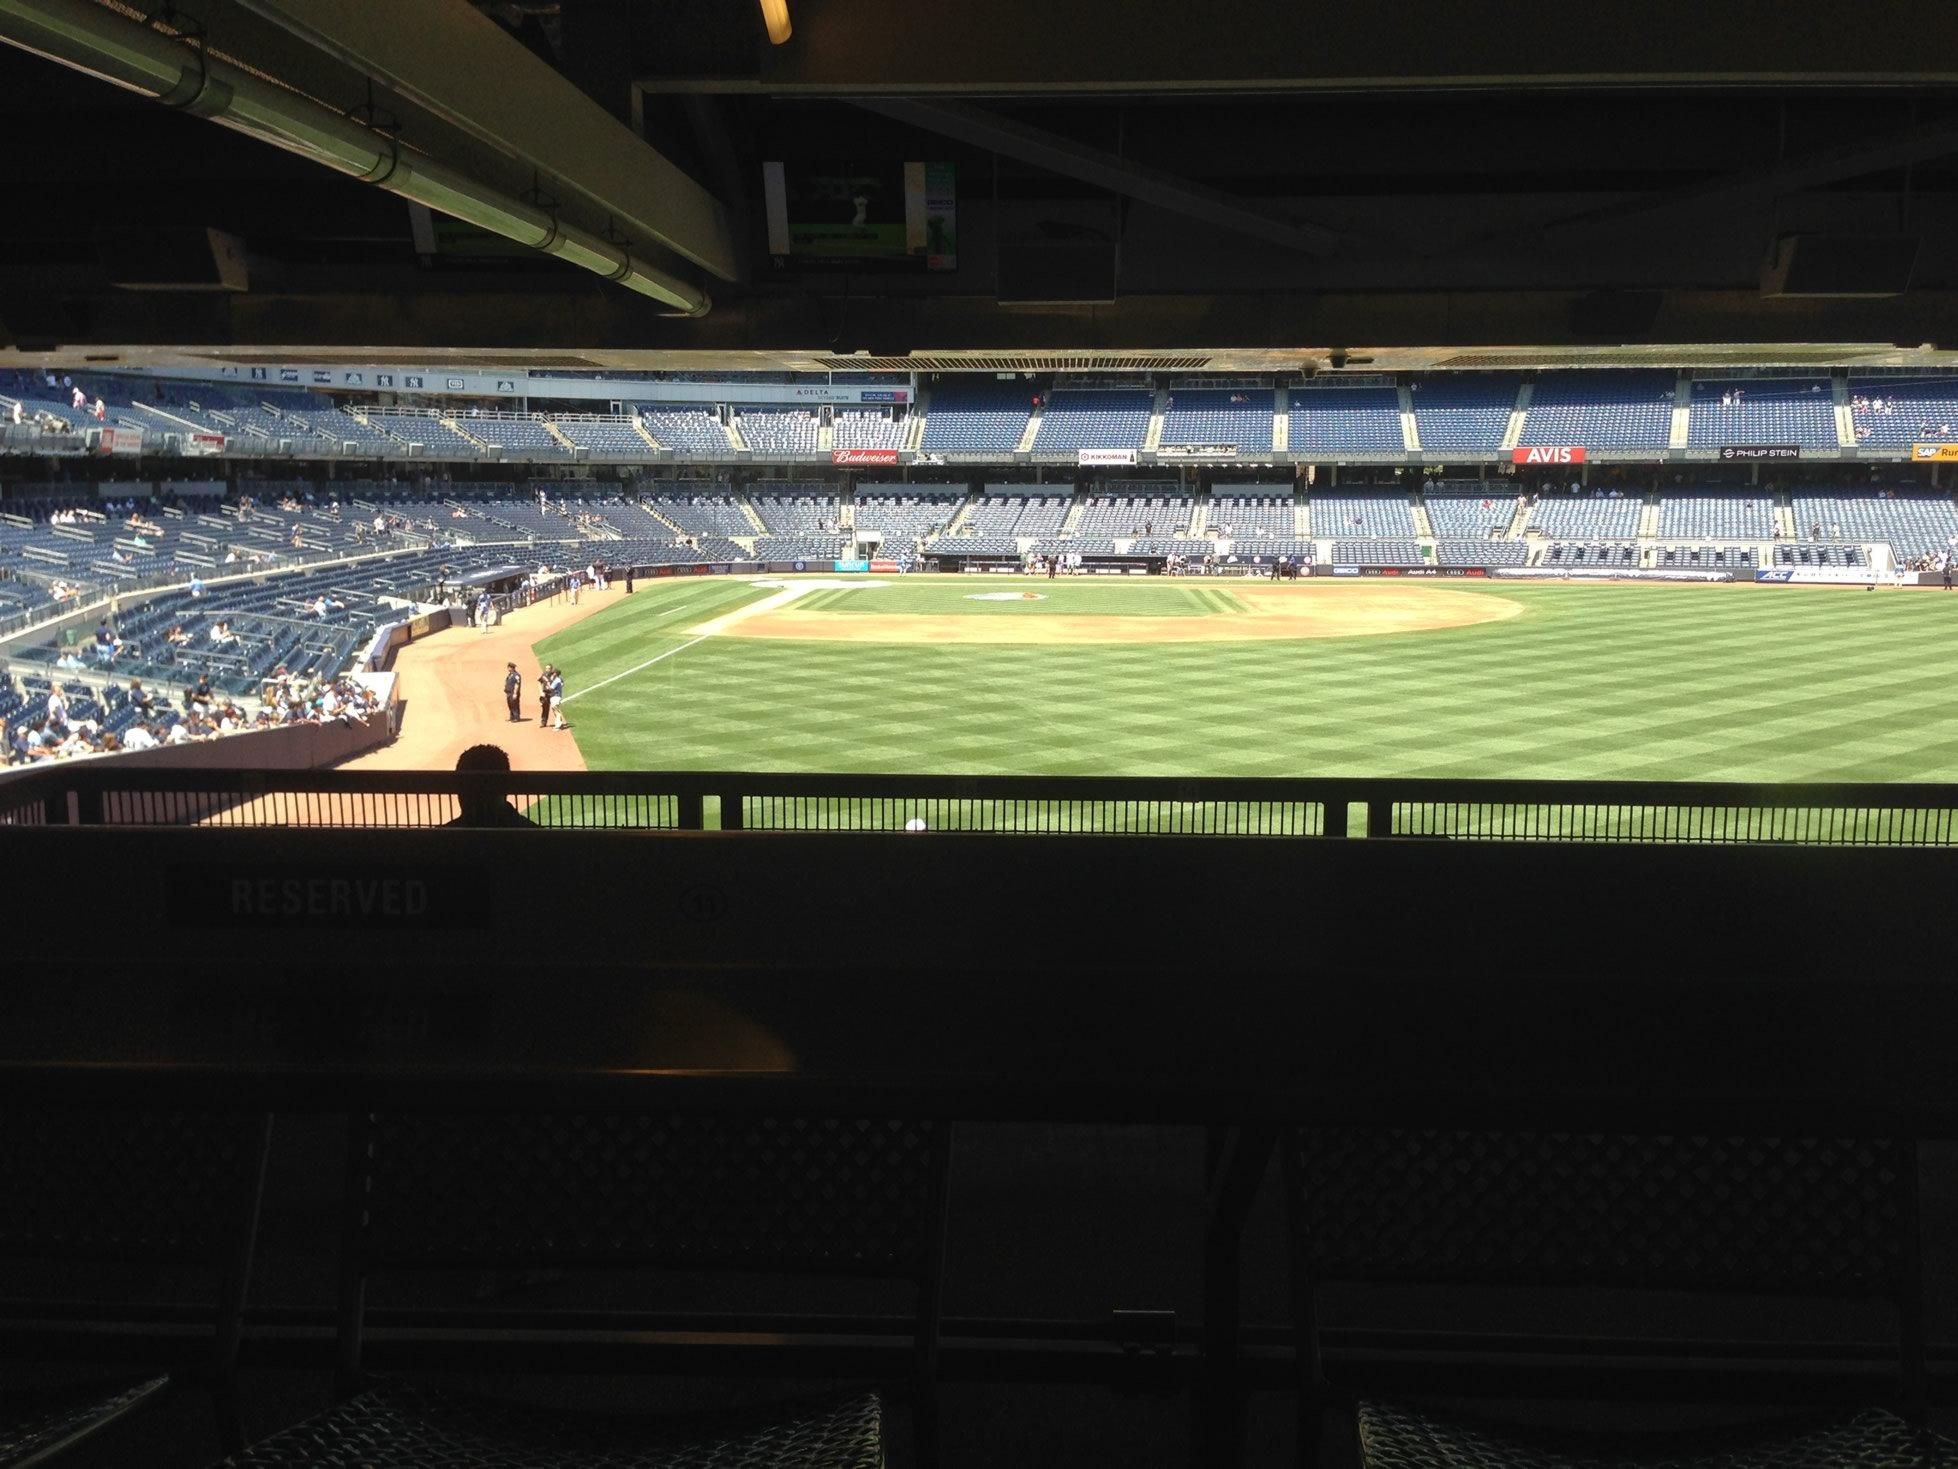 Yankee Stadium Seating for Yankees Games - RateYourSeats.com